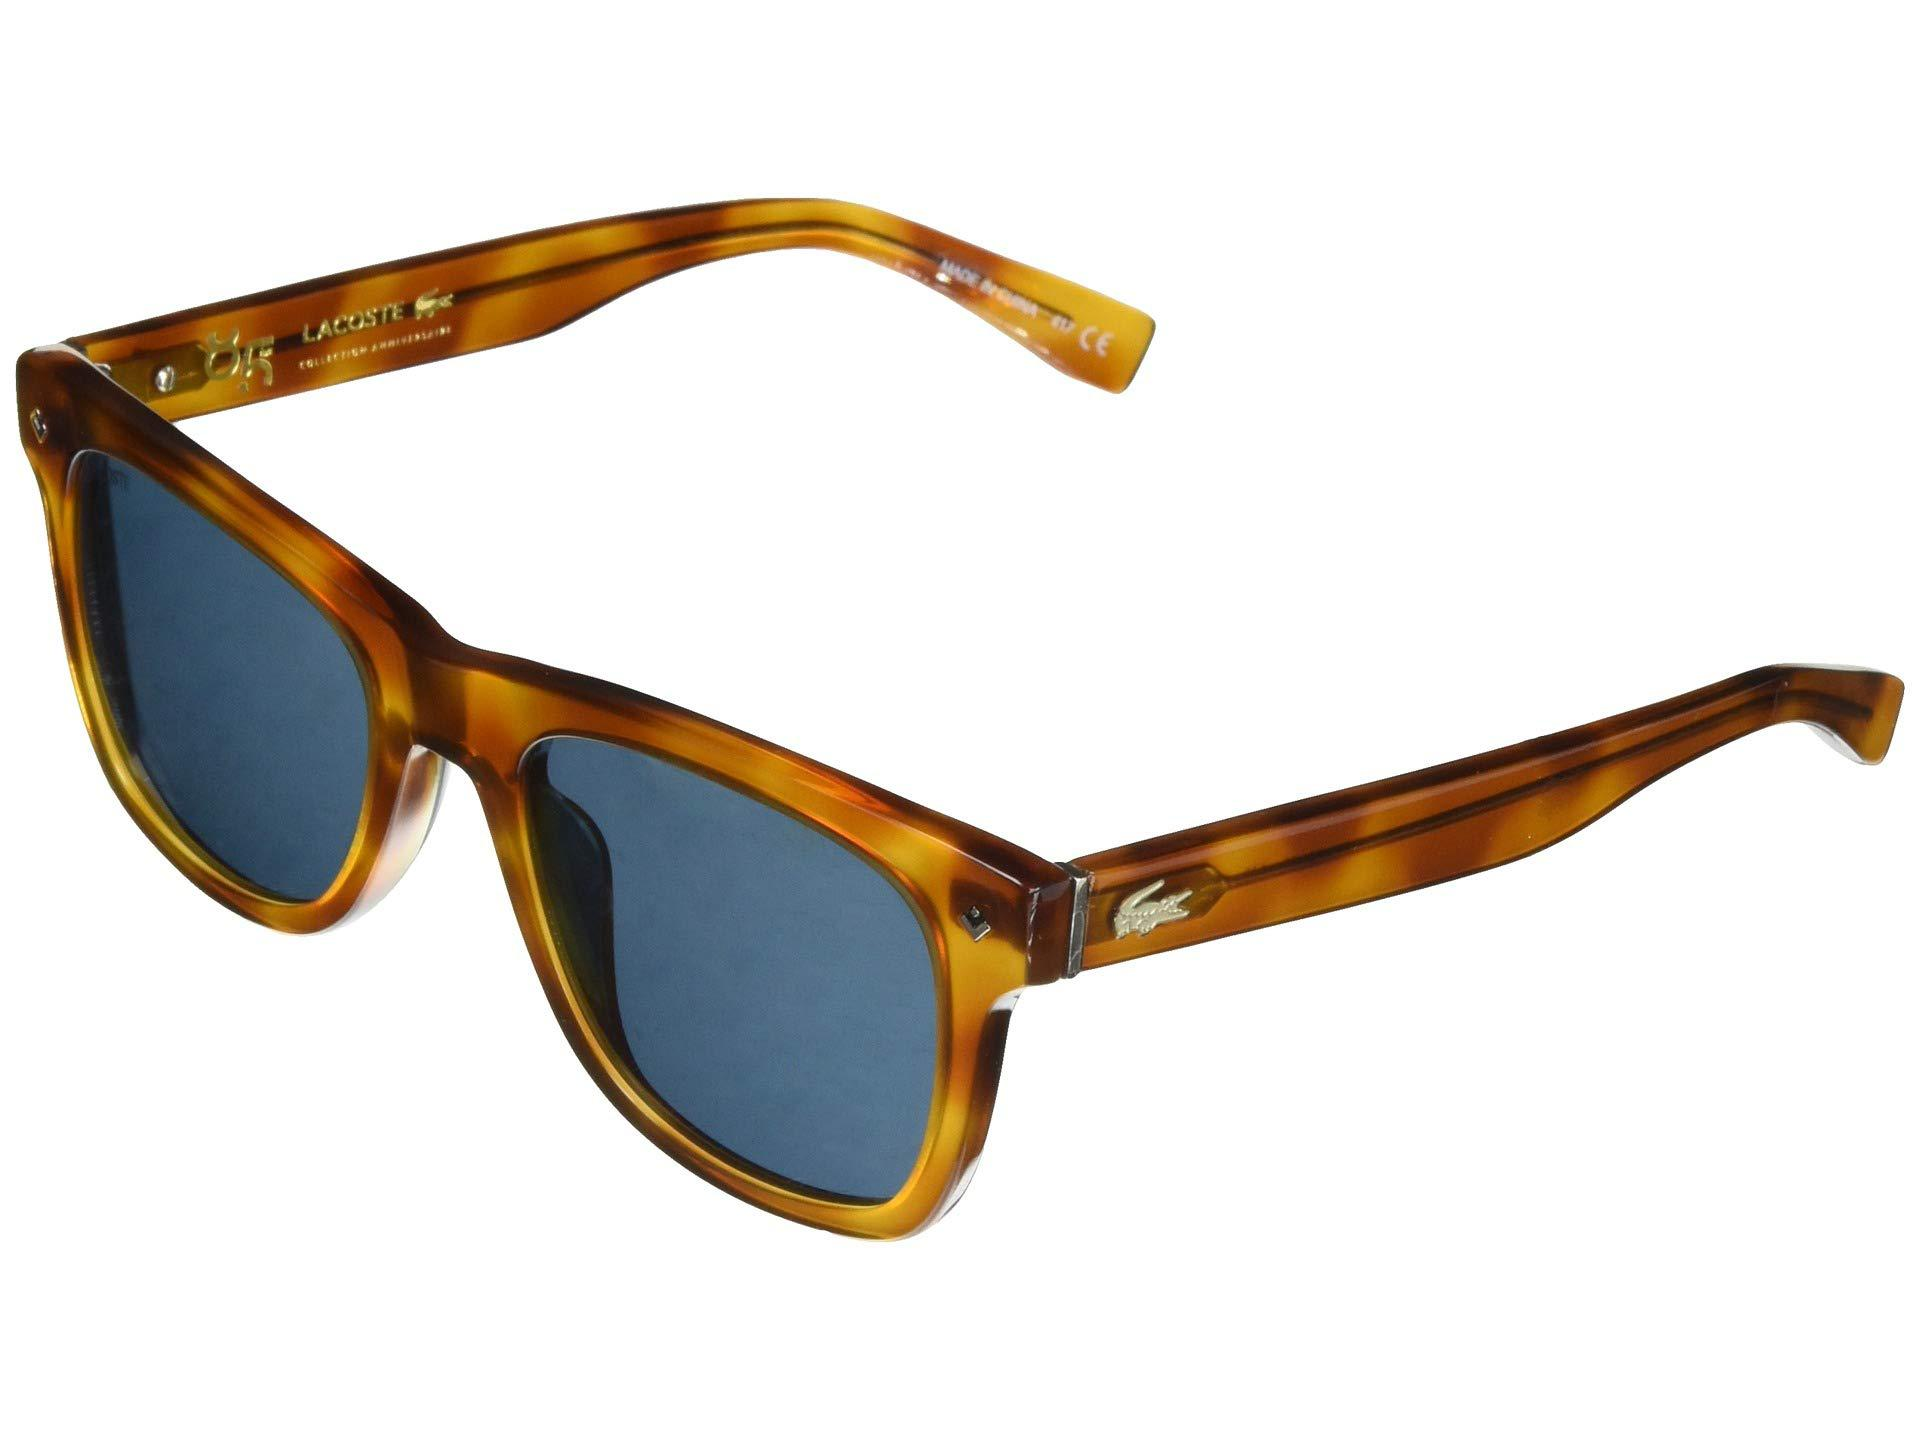 f8c0665fde7 Lyst - Lacoste L878s (blonde Havana) Fashion Sunglasses for Men